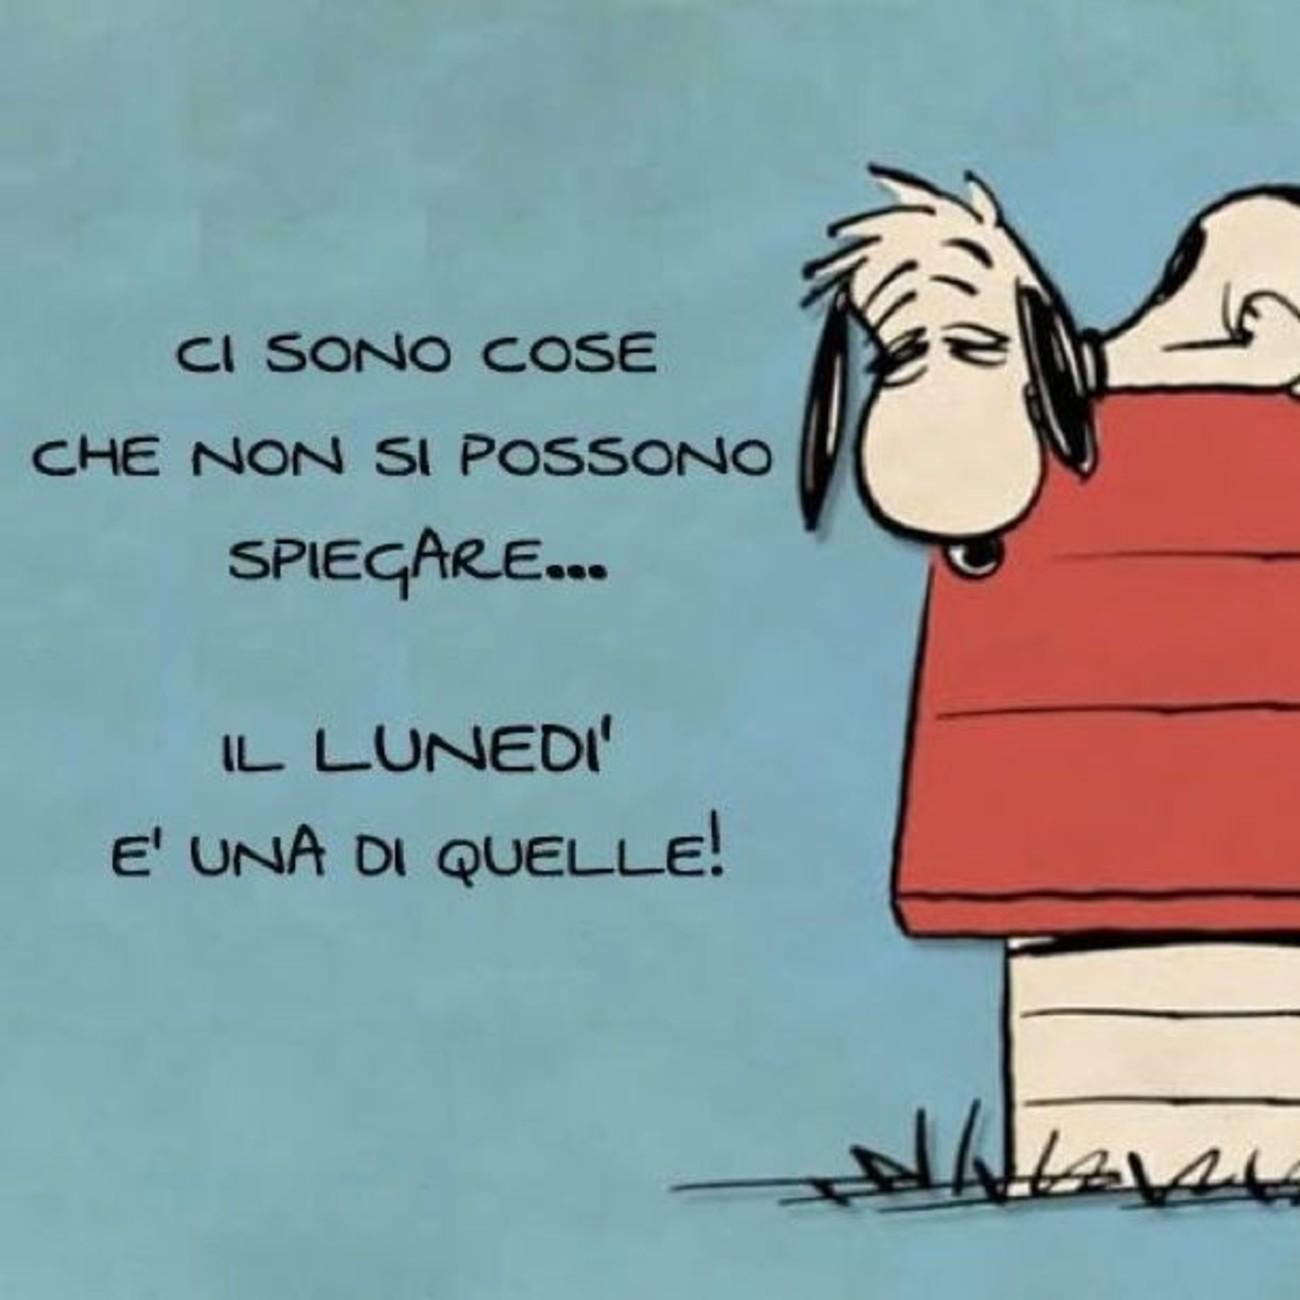 Lunedì con Snoopy